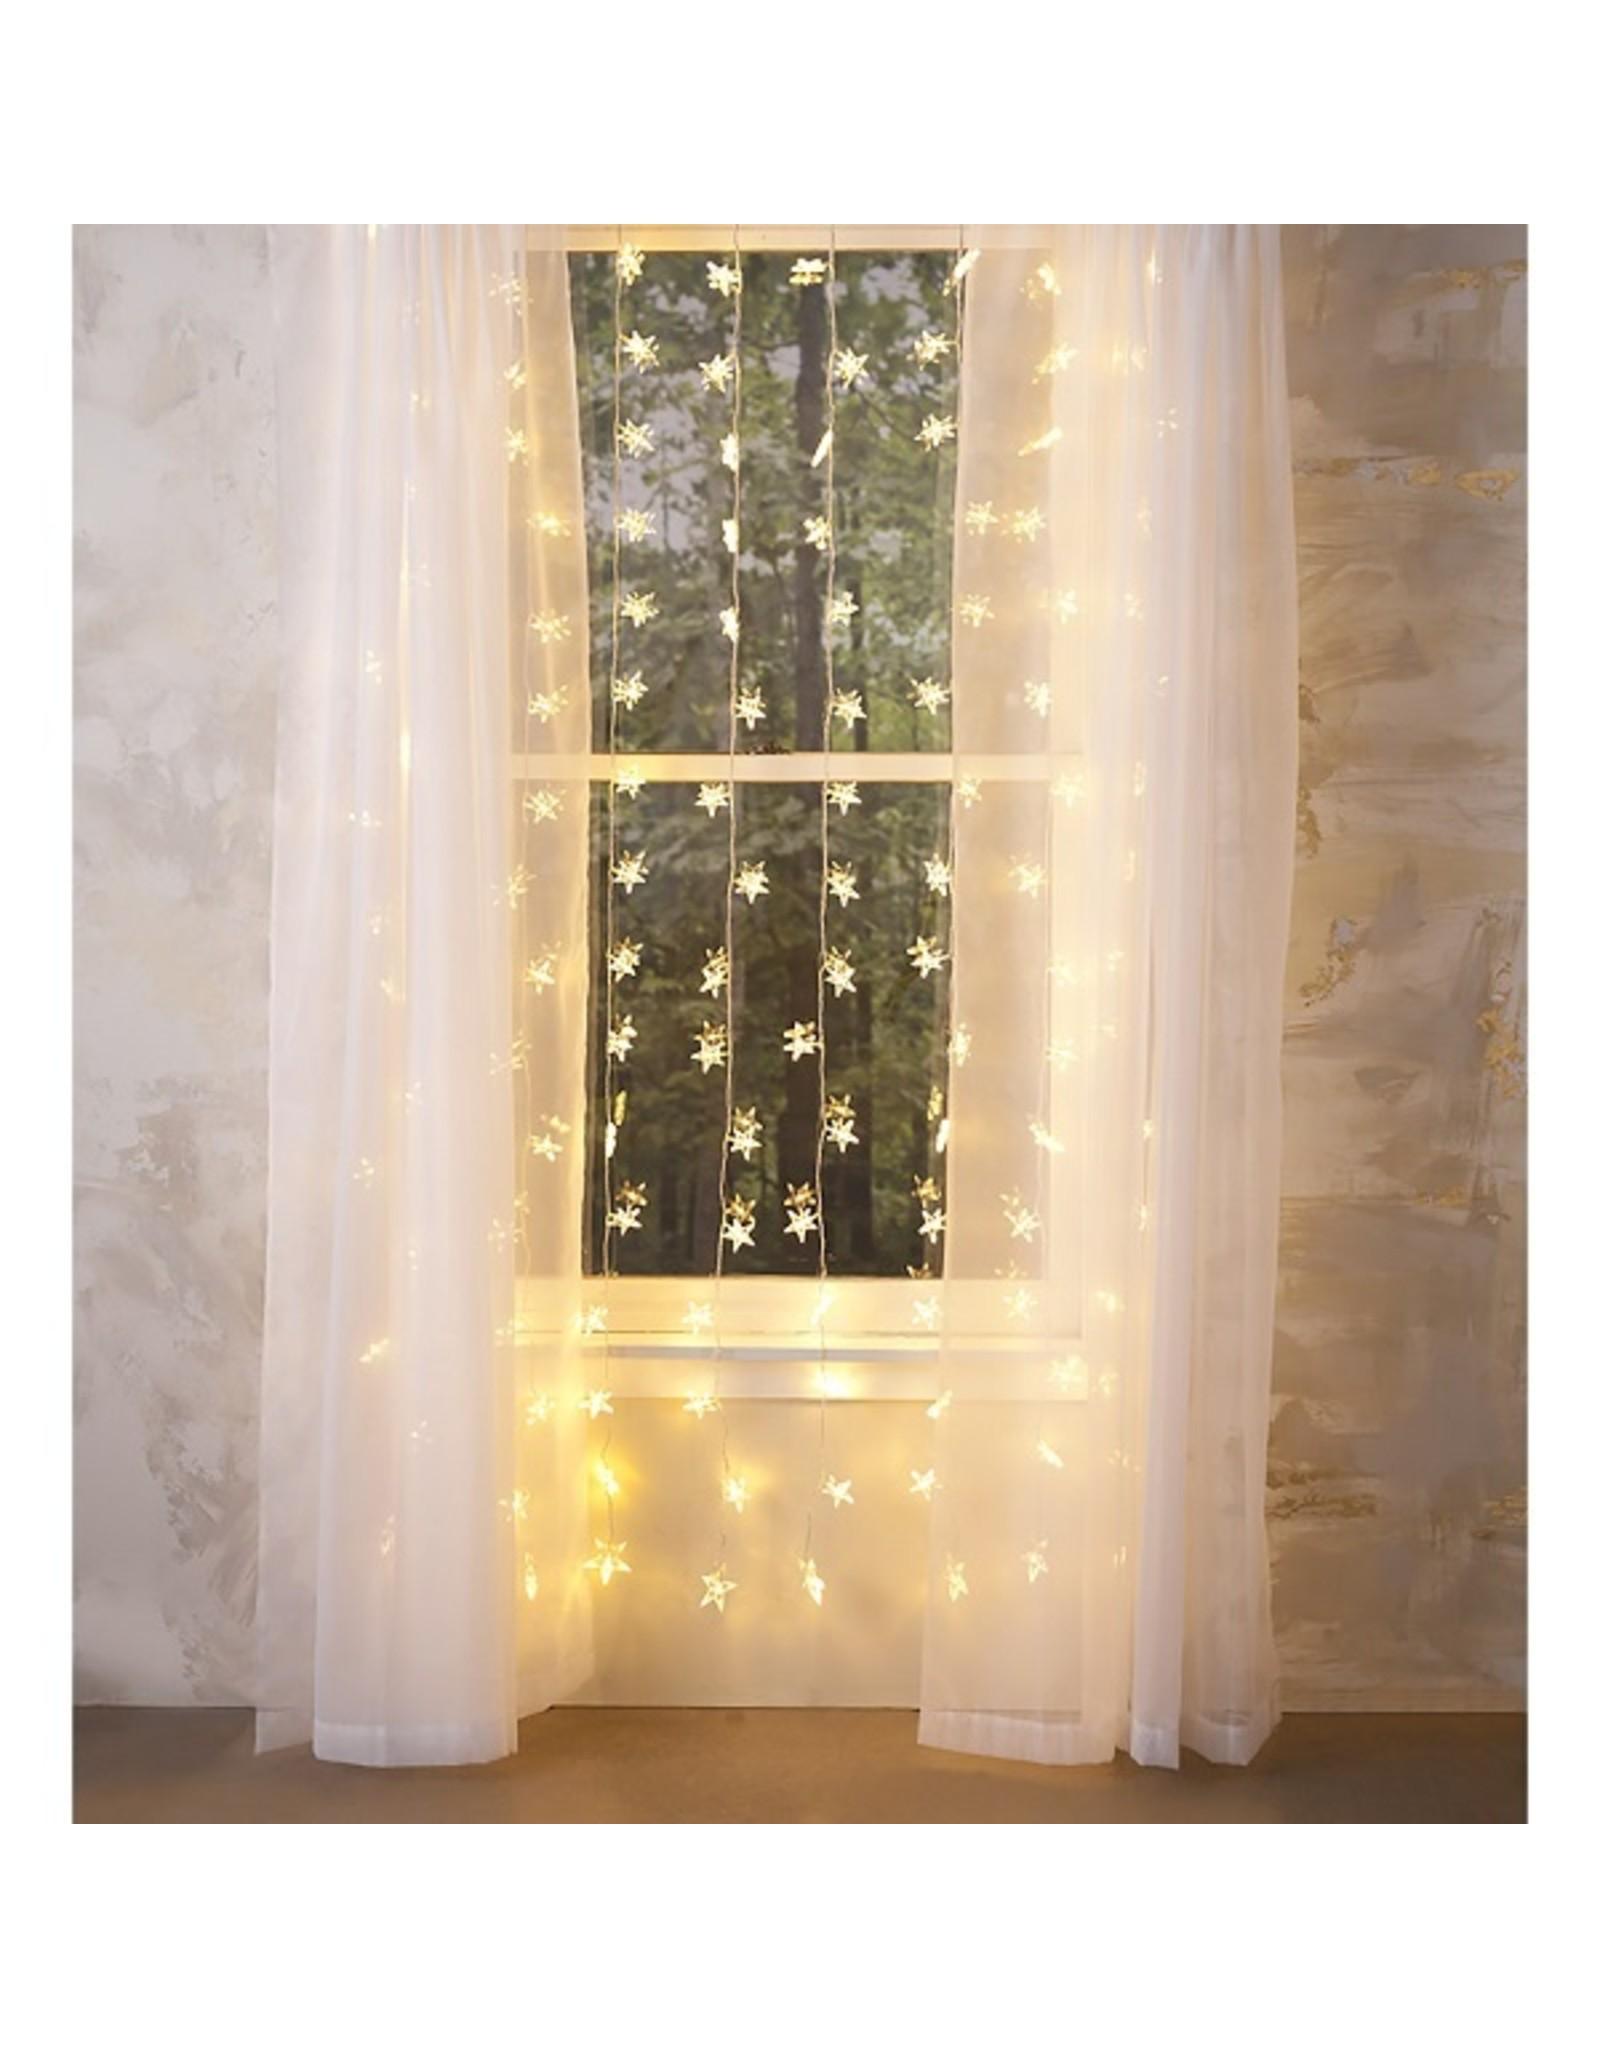 Evergreen STAR CURTAIN LIGHTS